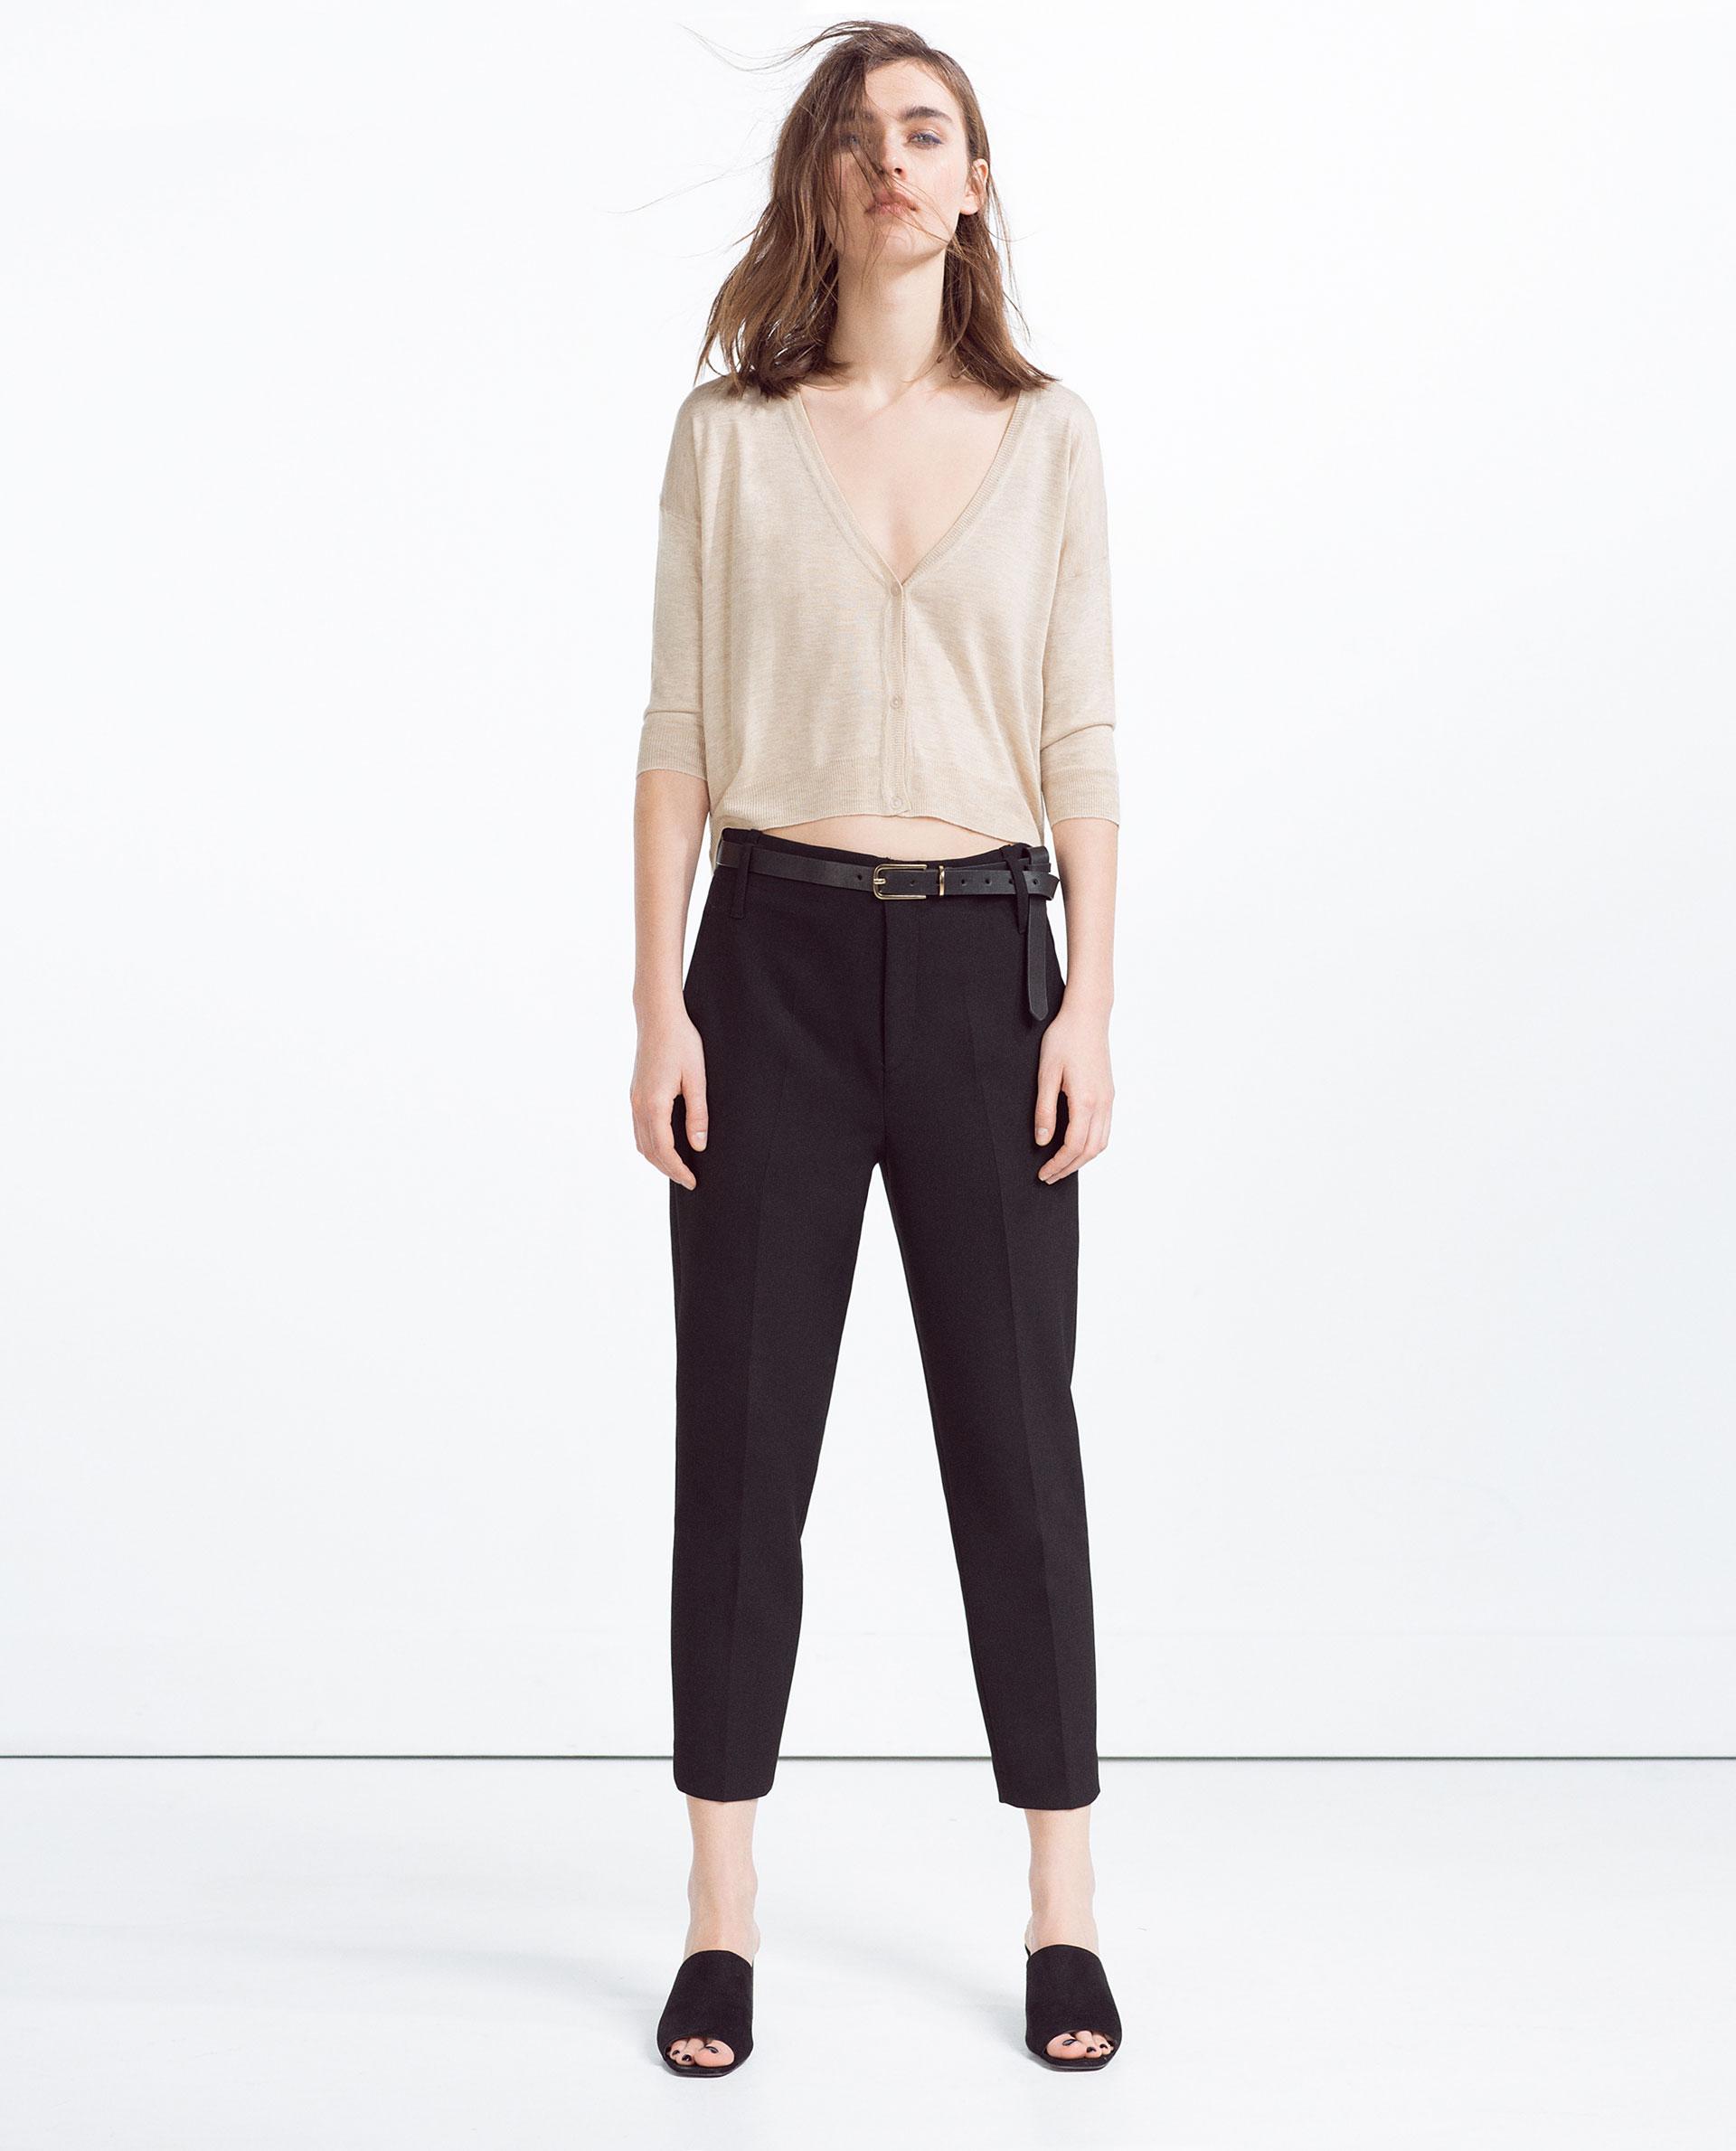 Pantaloni con le pinces